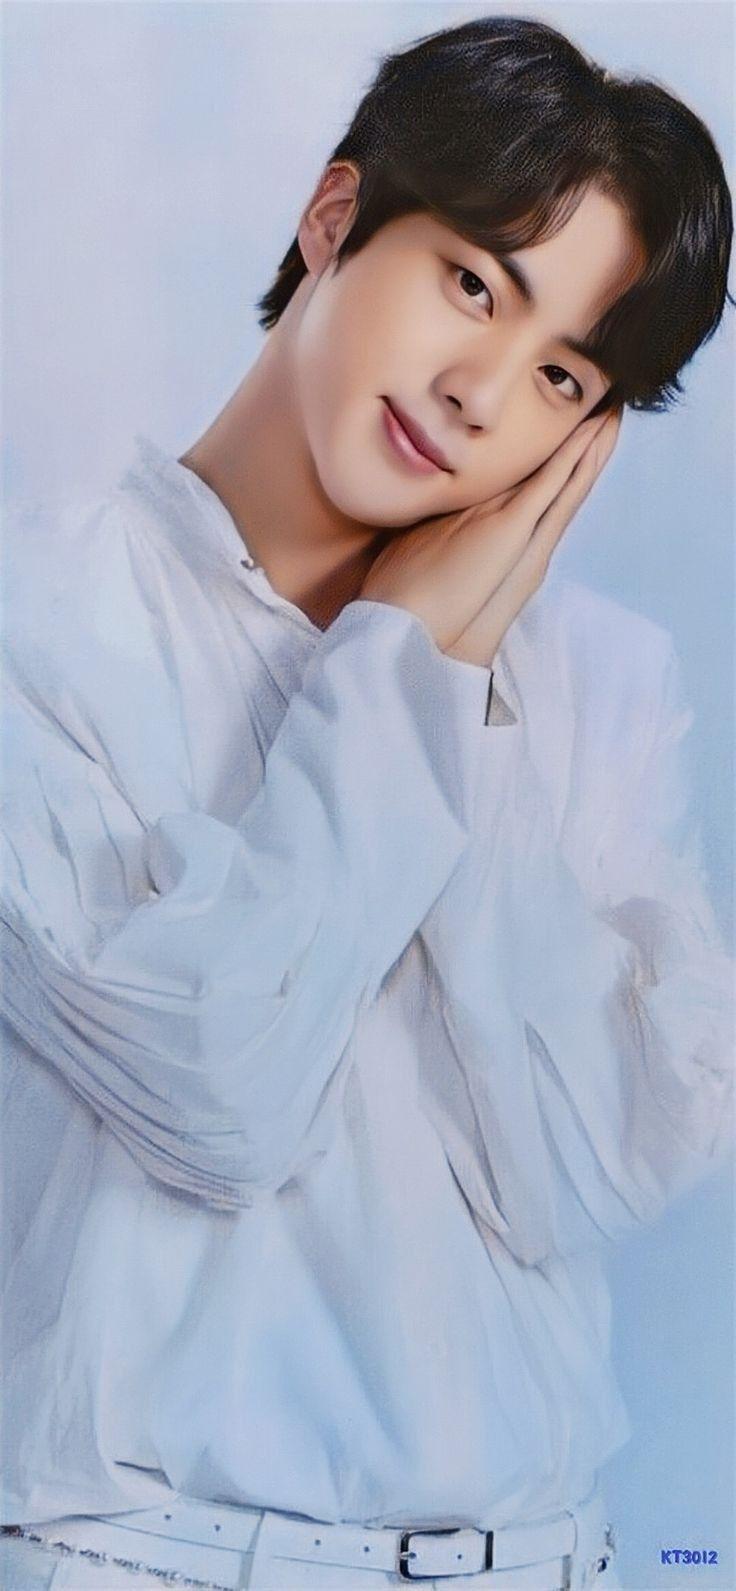 Pin By Kimtaetaekook On Jin In 2020 Bts Jin Kim Seokjin Birthday Bts Korea